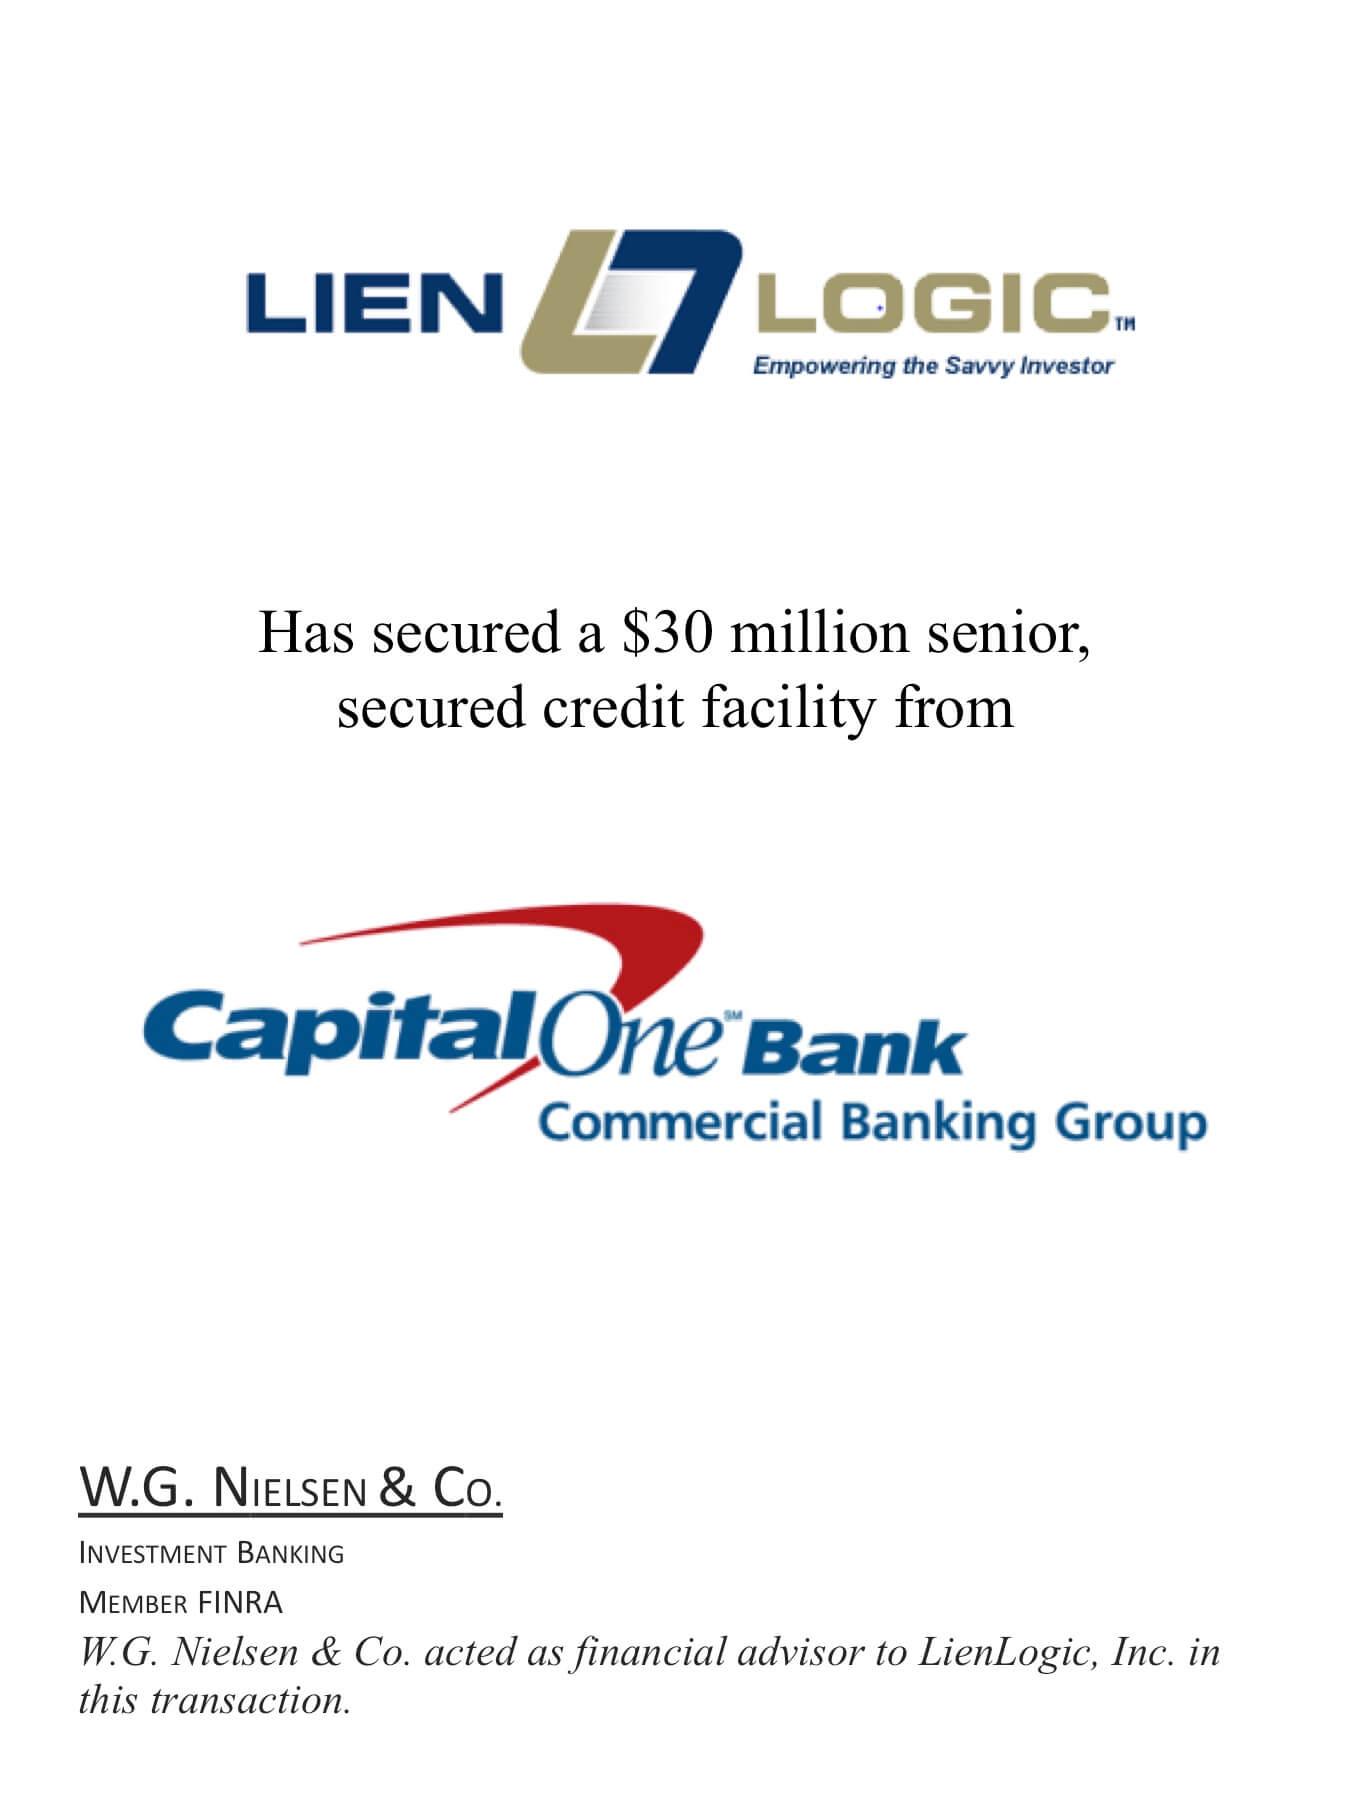 lien logic investment banking transaction